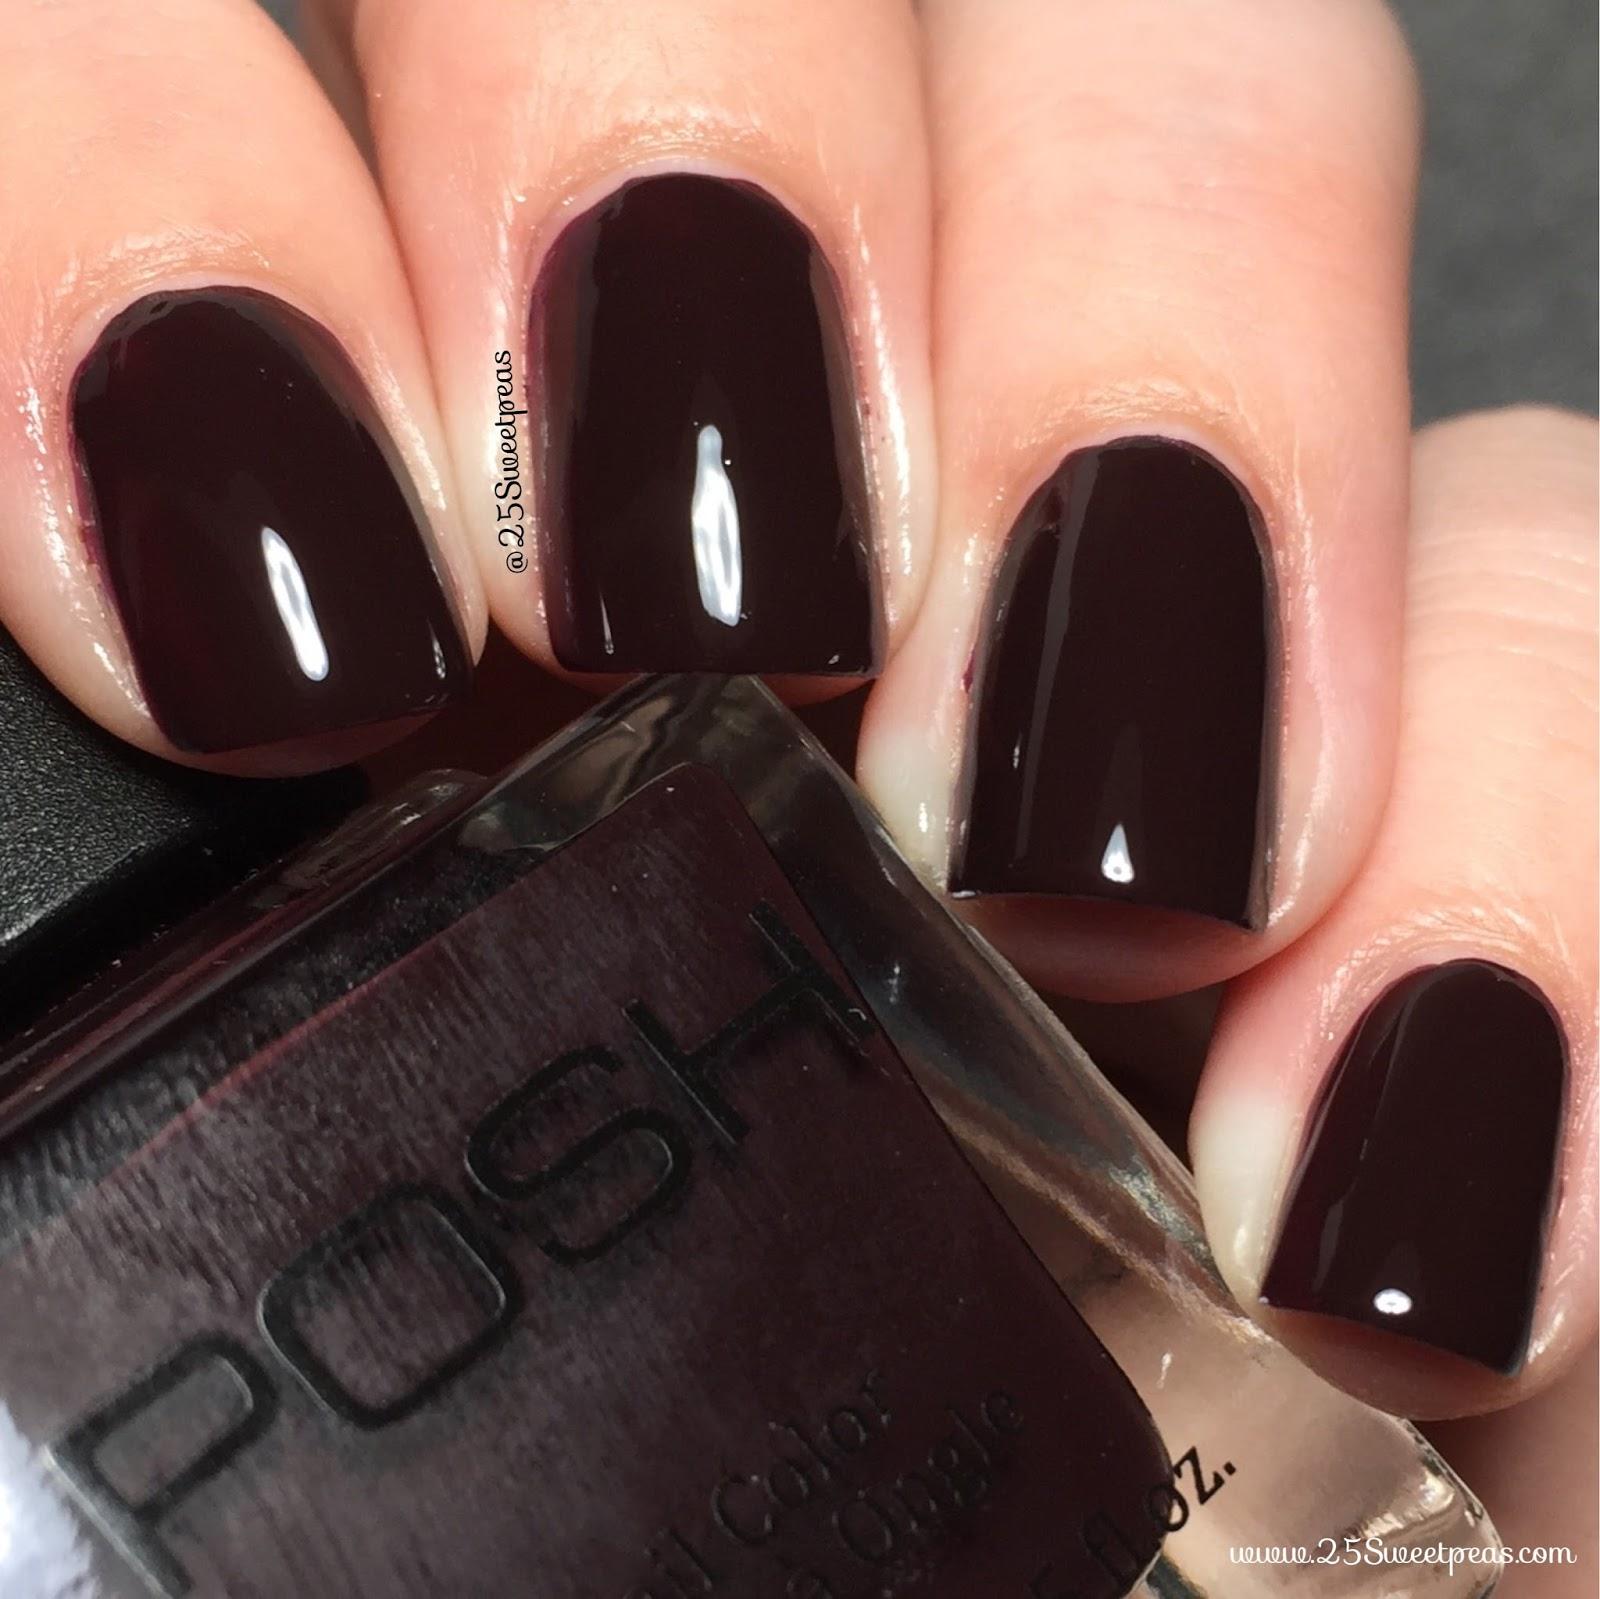 Posh Nail Color | Wine a Bit - 25 Sweetpeas